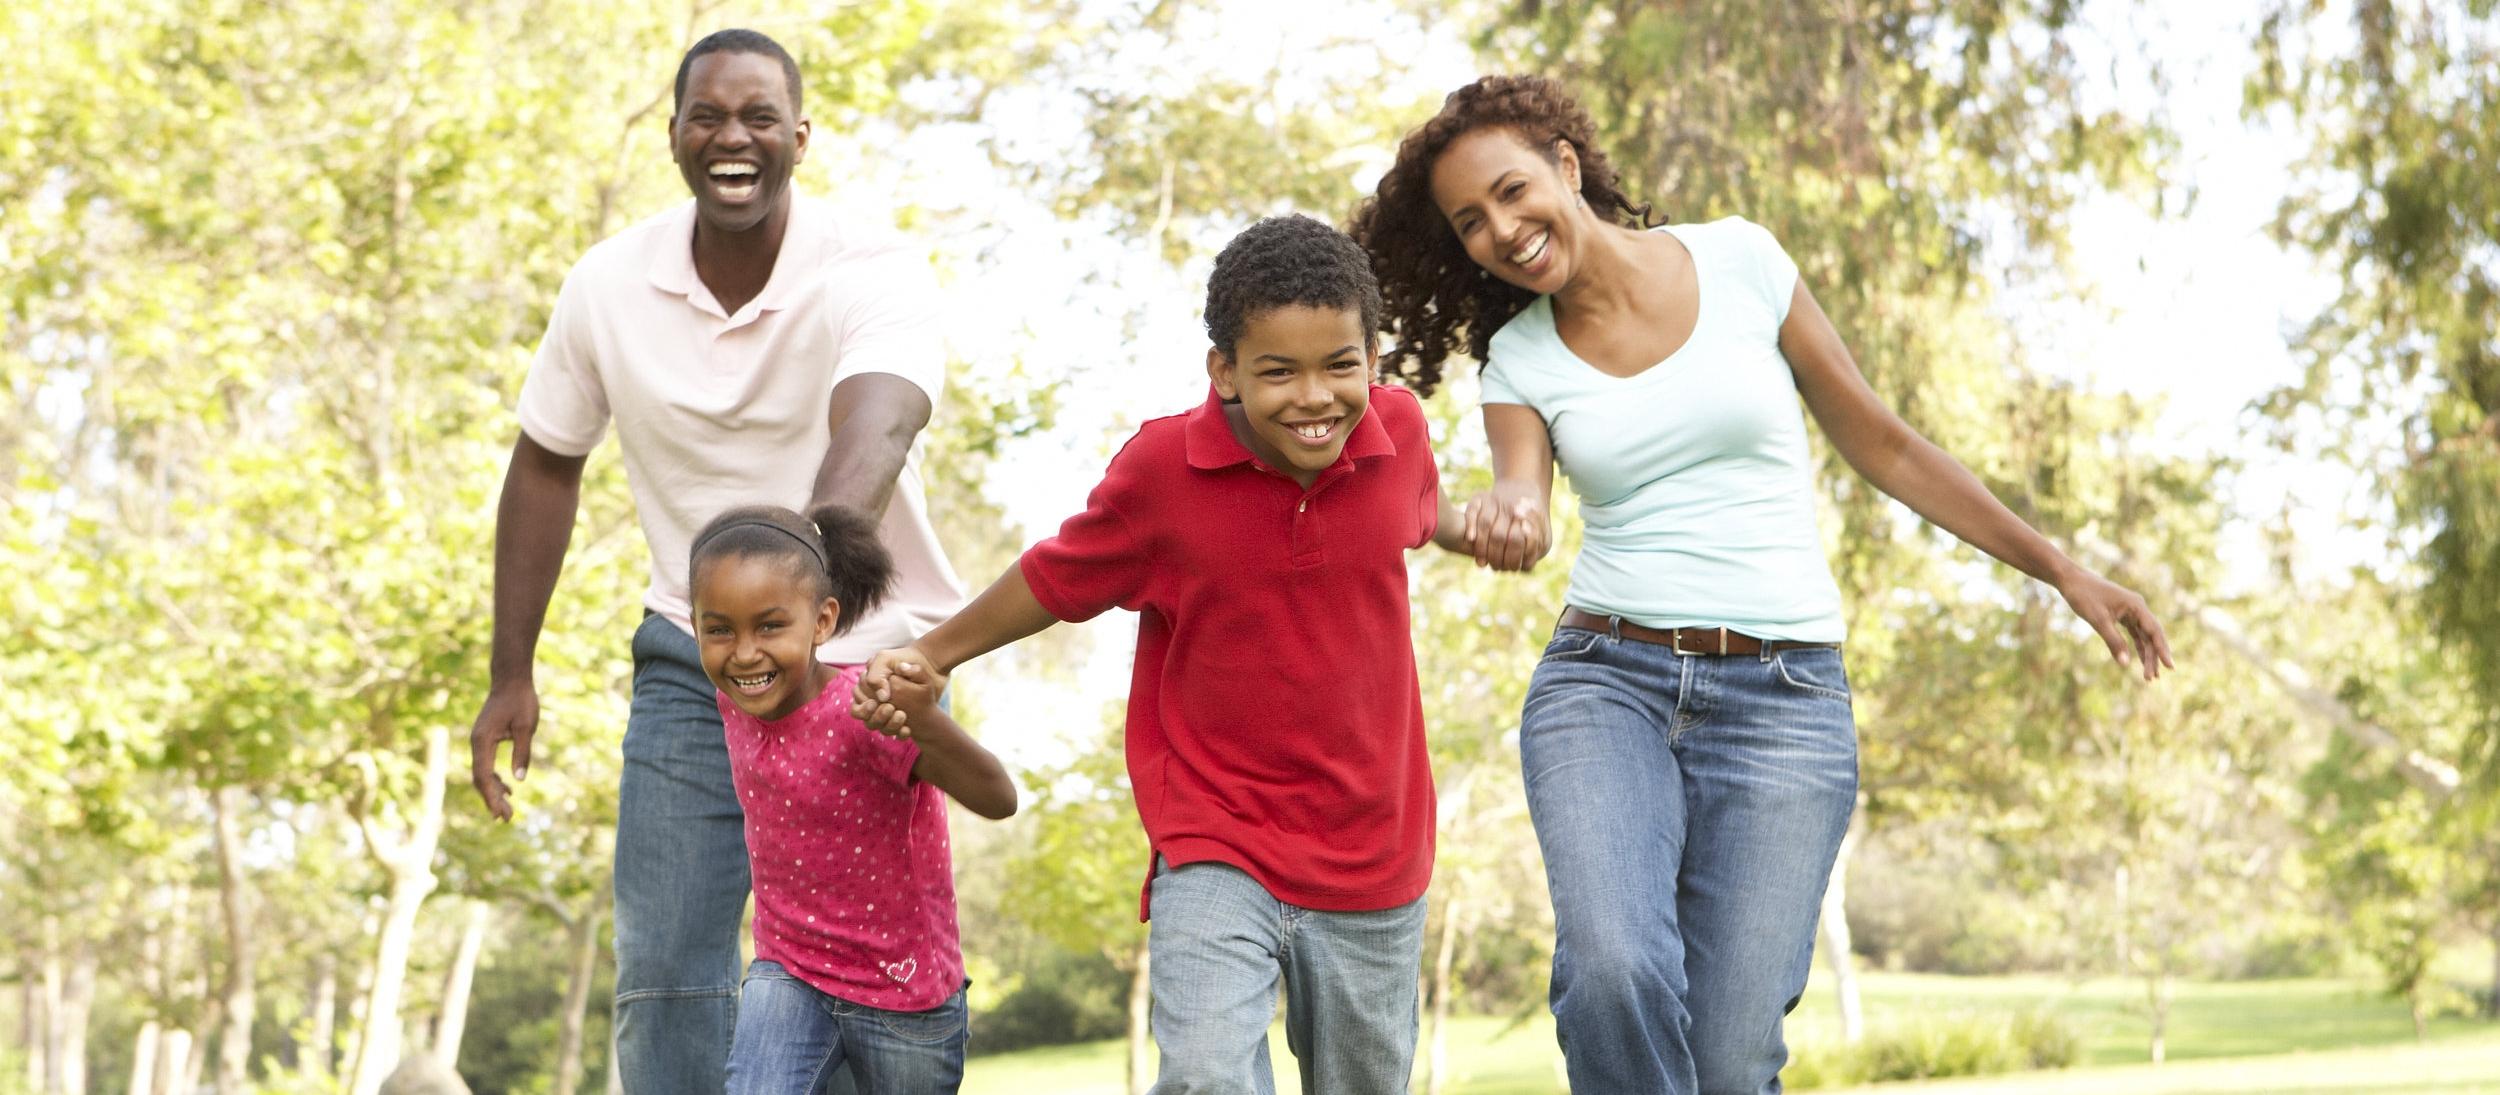 bigstock-Family-Enjoying-Walk-In-Park-13909580.jpg